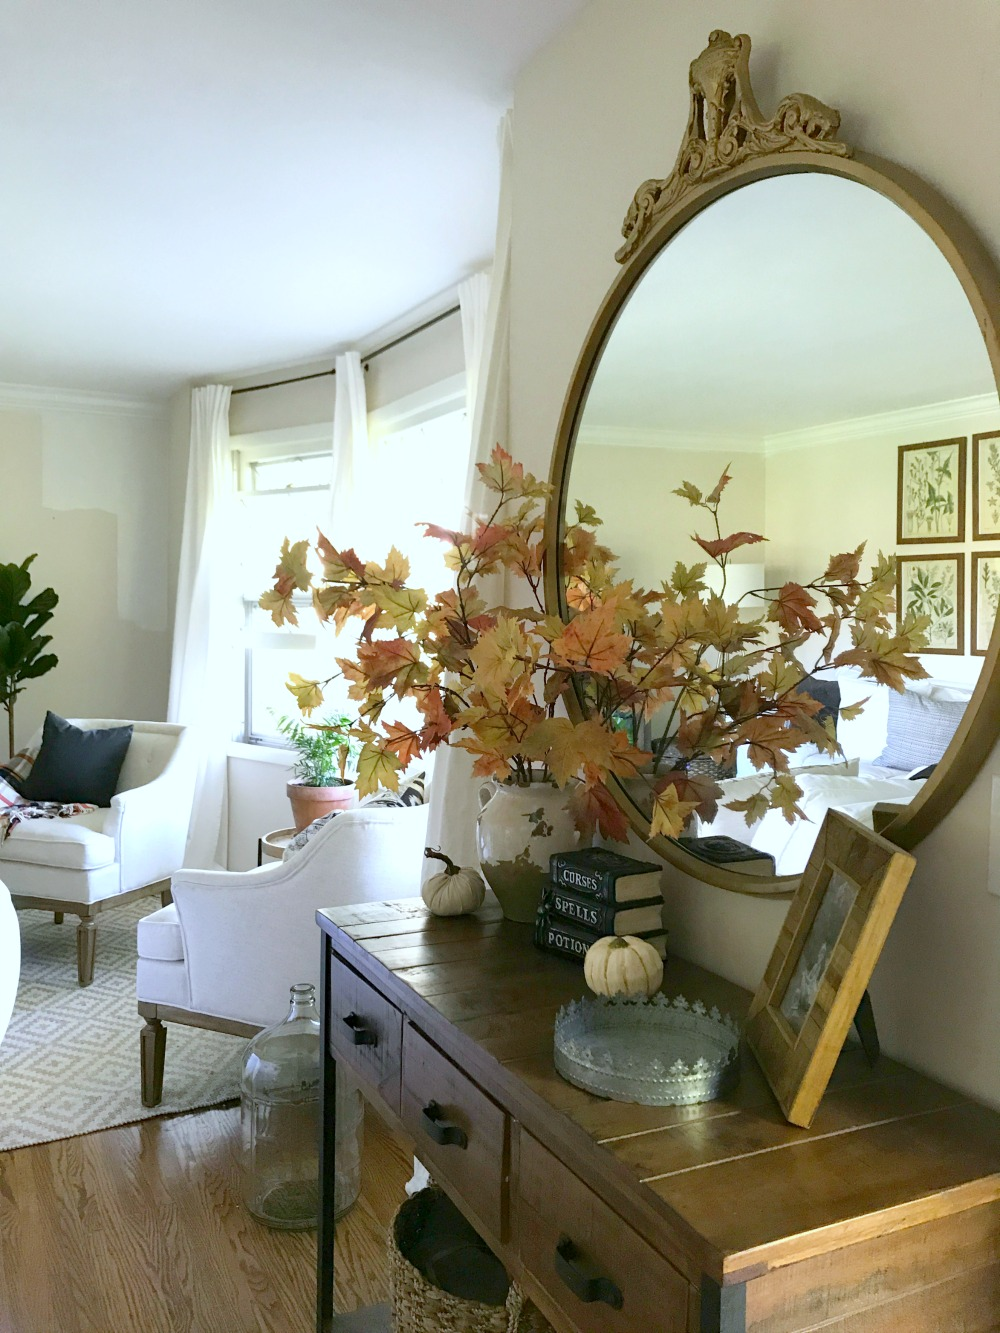 3 Essentials for Home Decorating